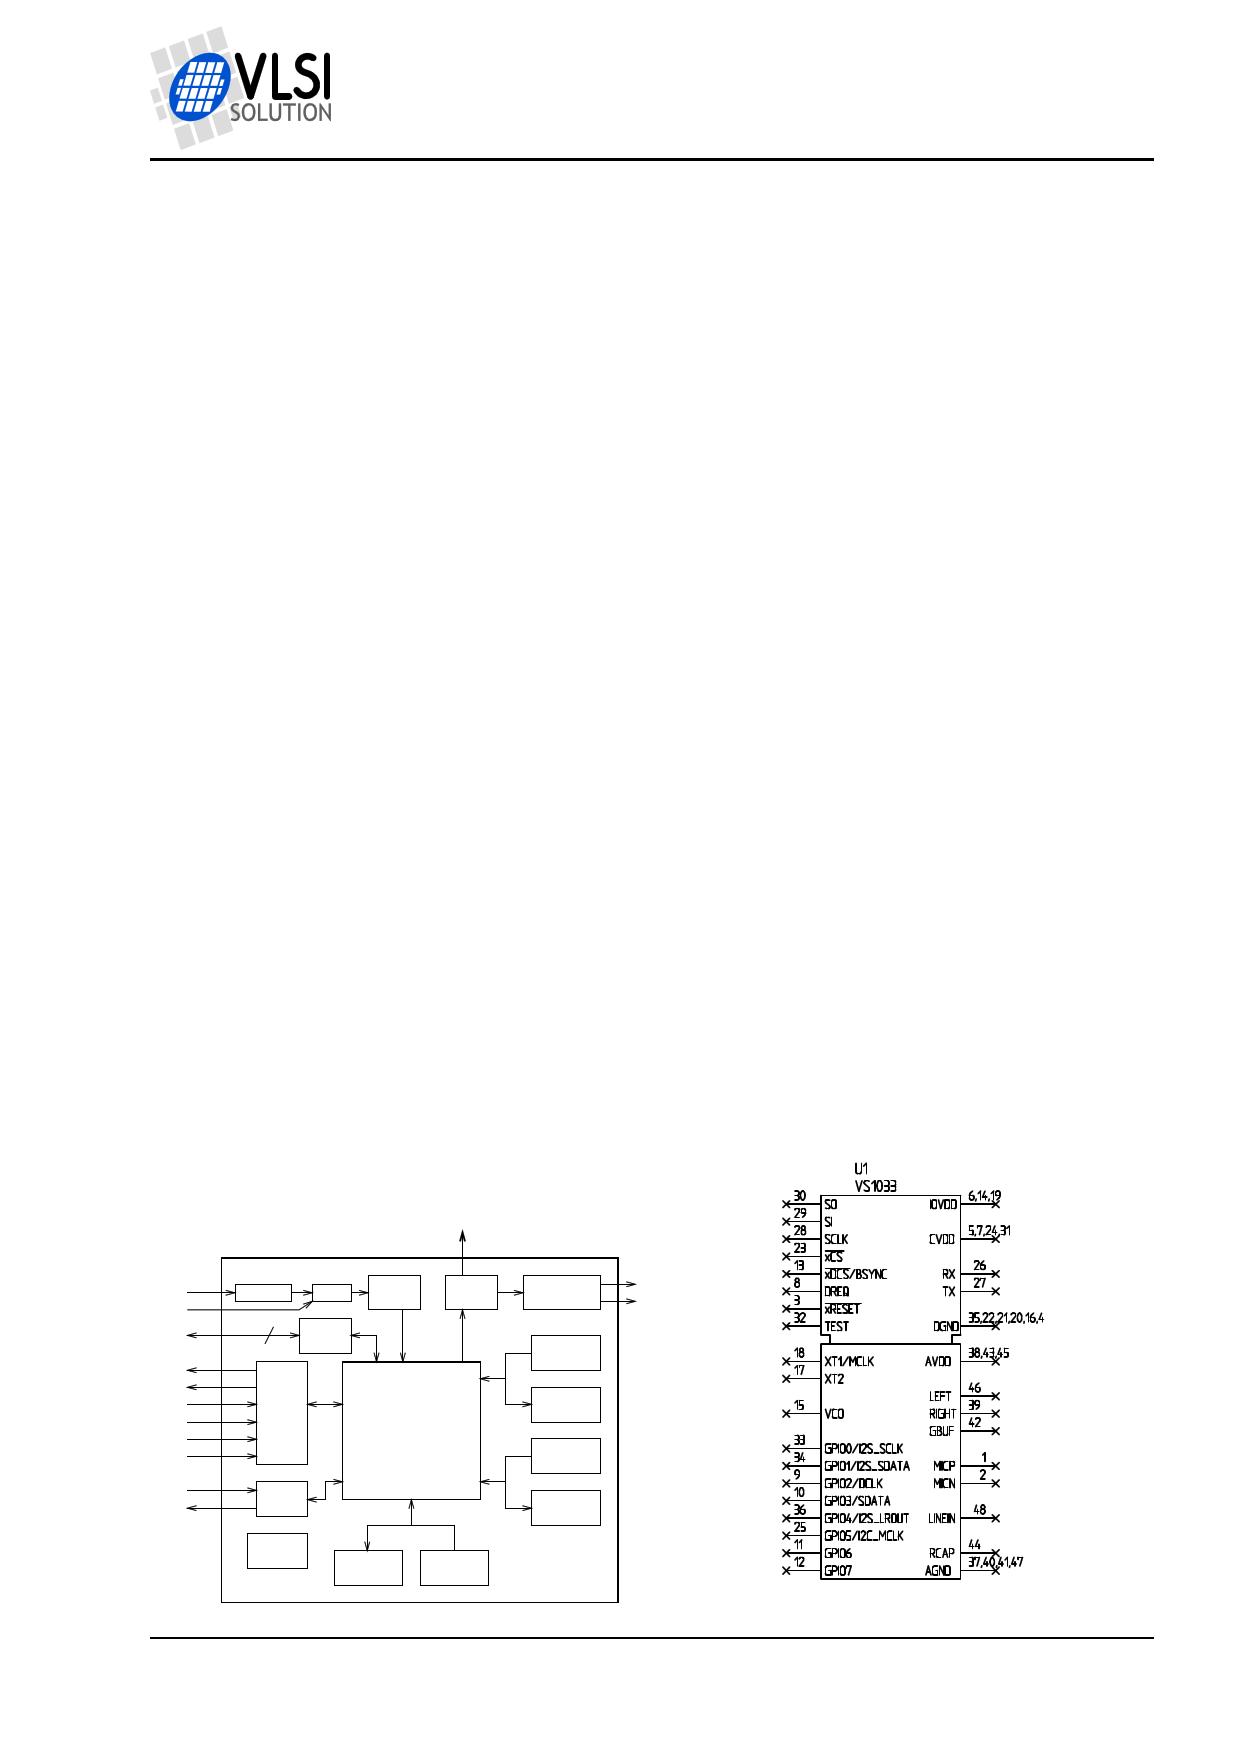 vs1033d datasheet pdf   pinout    aac  wma  midi audio codec